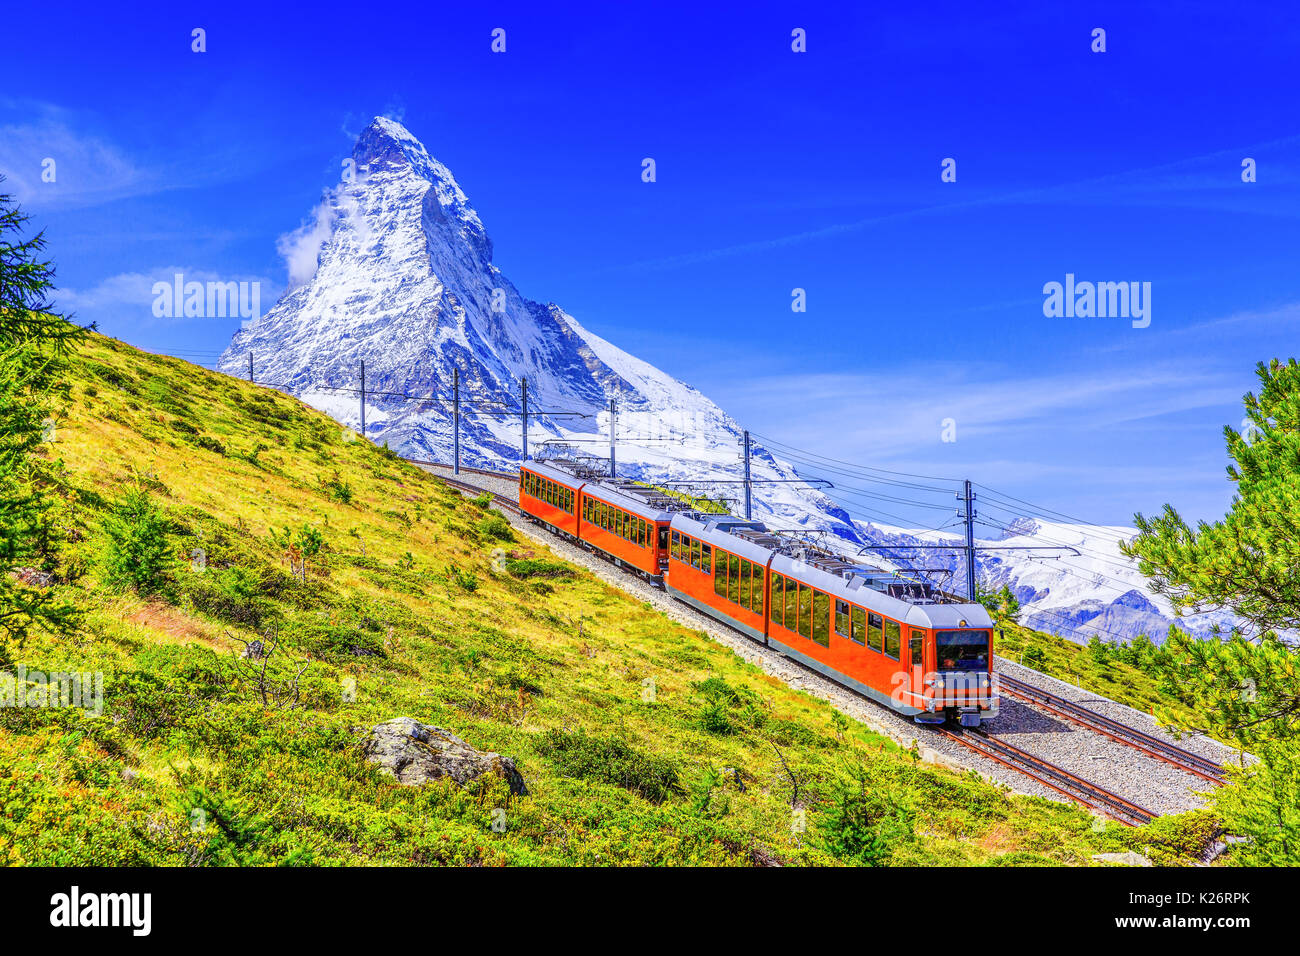 Zermatt, Suiza. Gornergrat tren turístico de montaña Matterhorn en el fondo. Región de Valais. Imagen De Stock